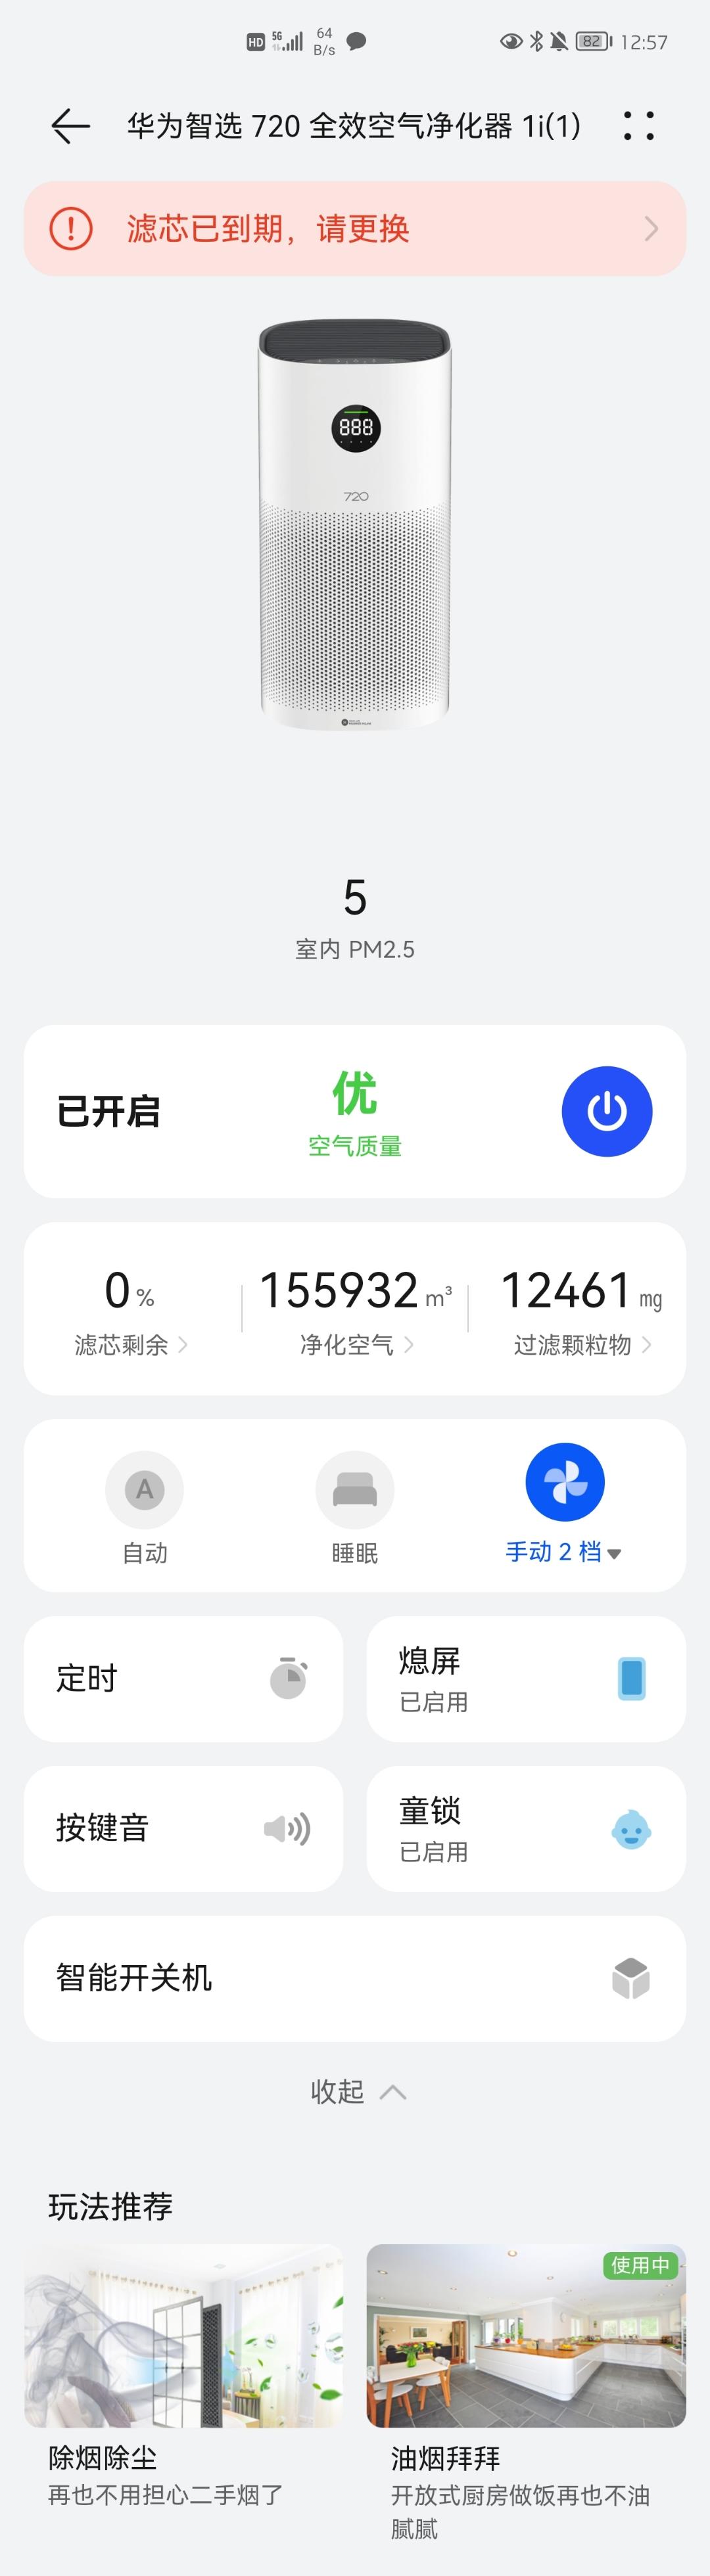 Screenshot_20210902_125743_com.huawei.smarthome.jpg